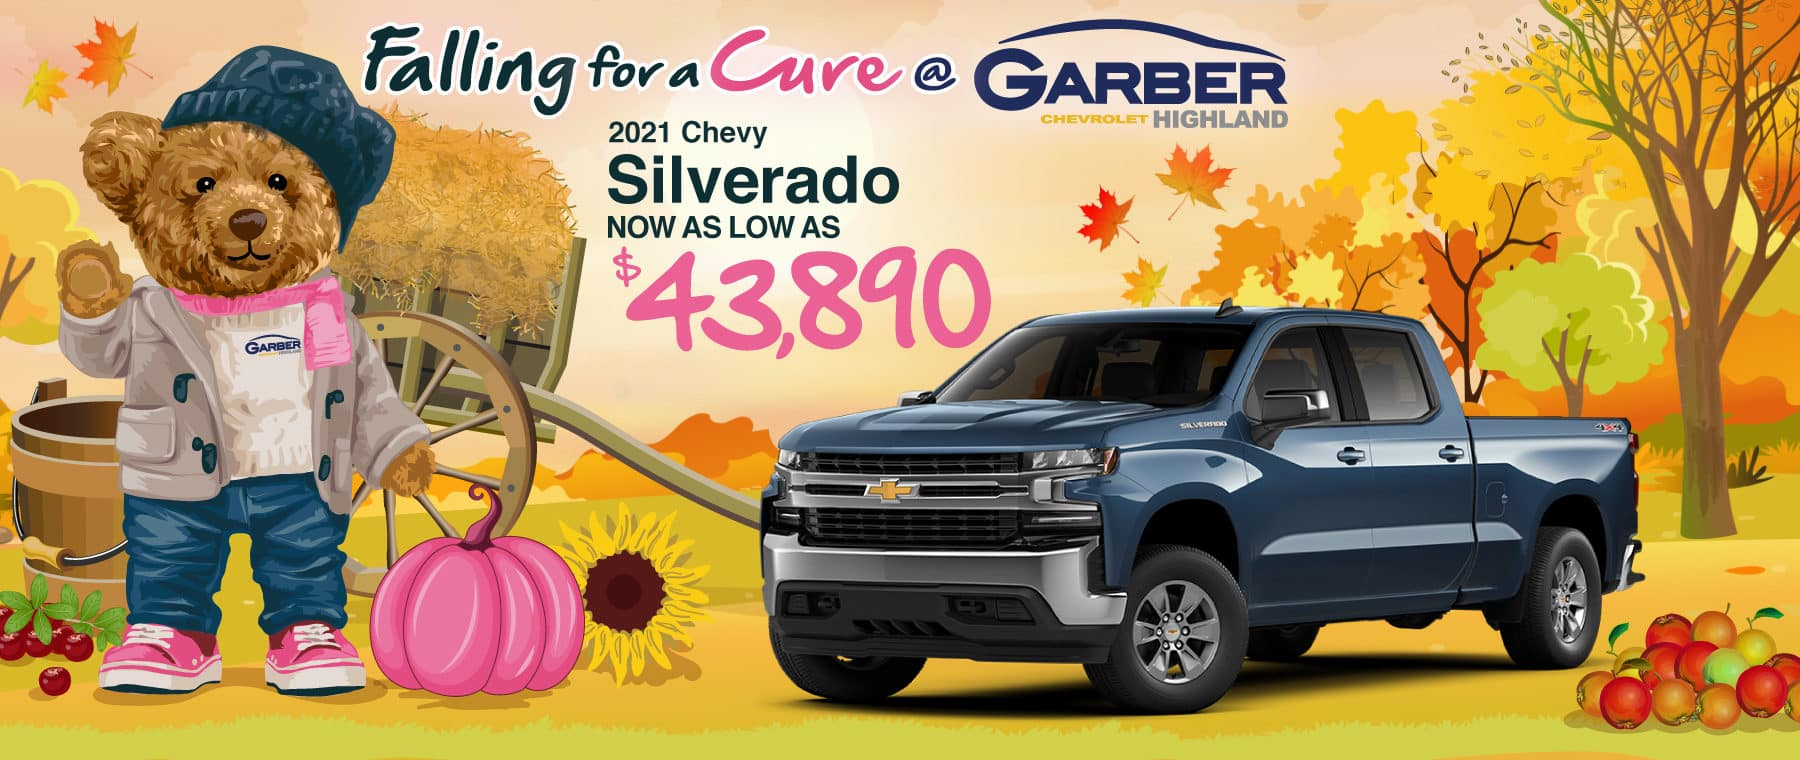 2021 Chevy Silverado as low as $43,890